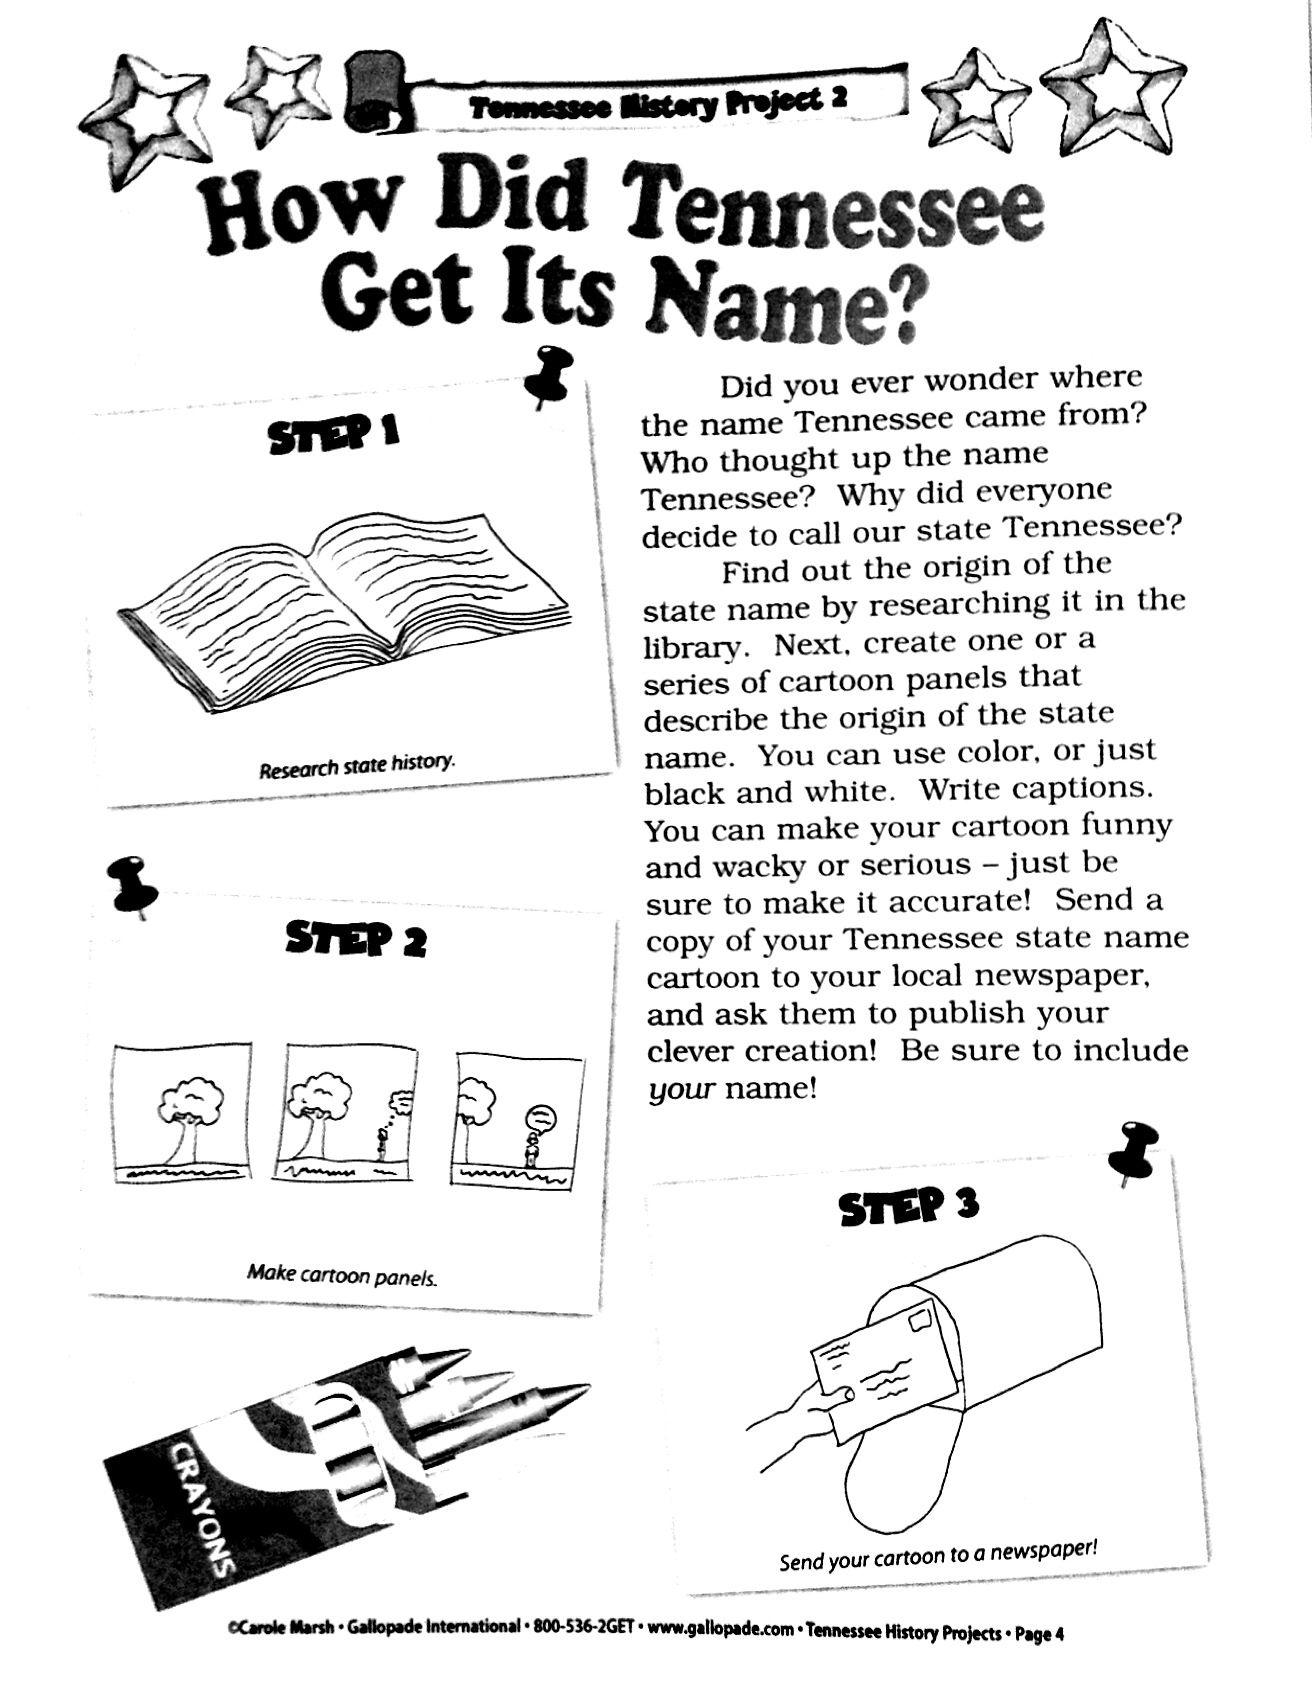 Tennessee Name Origin Cartoon K 5 Visual Art And